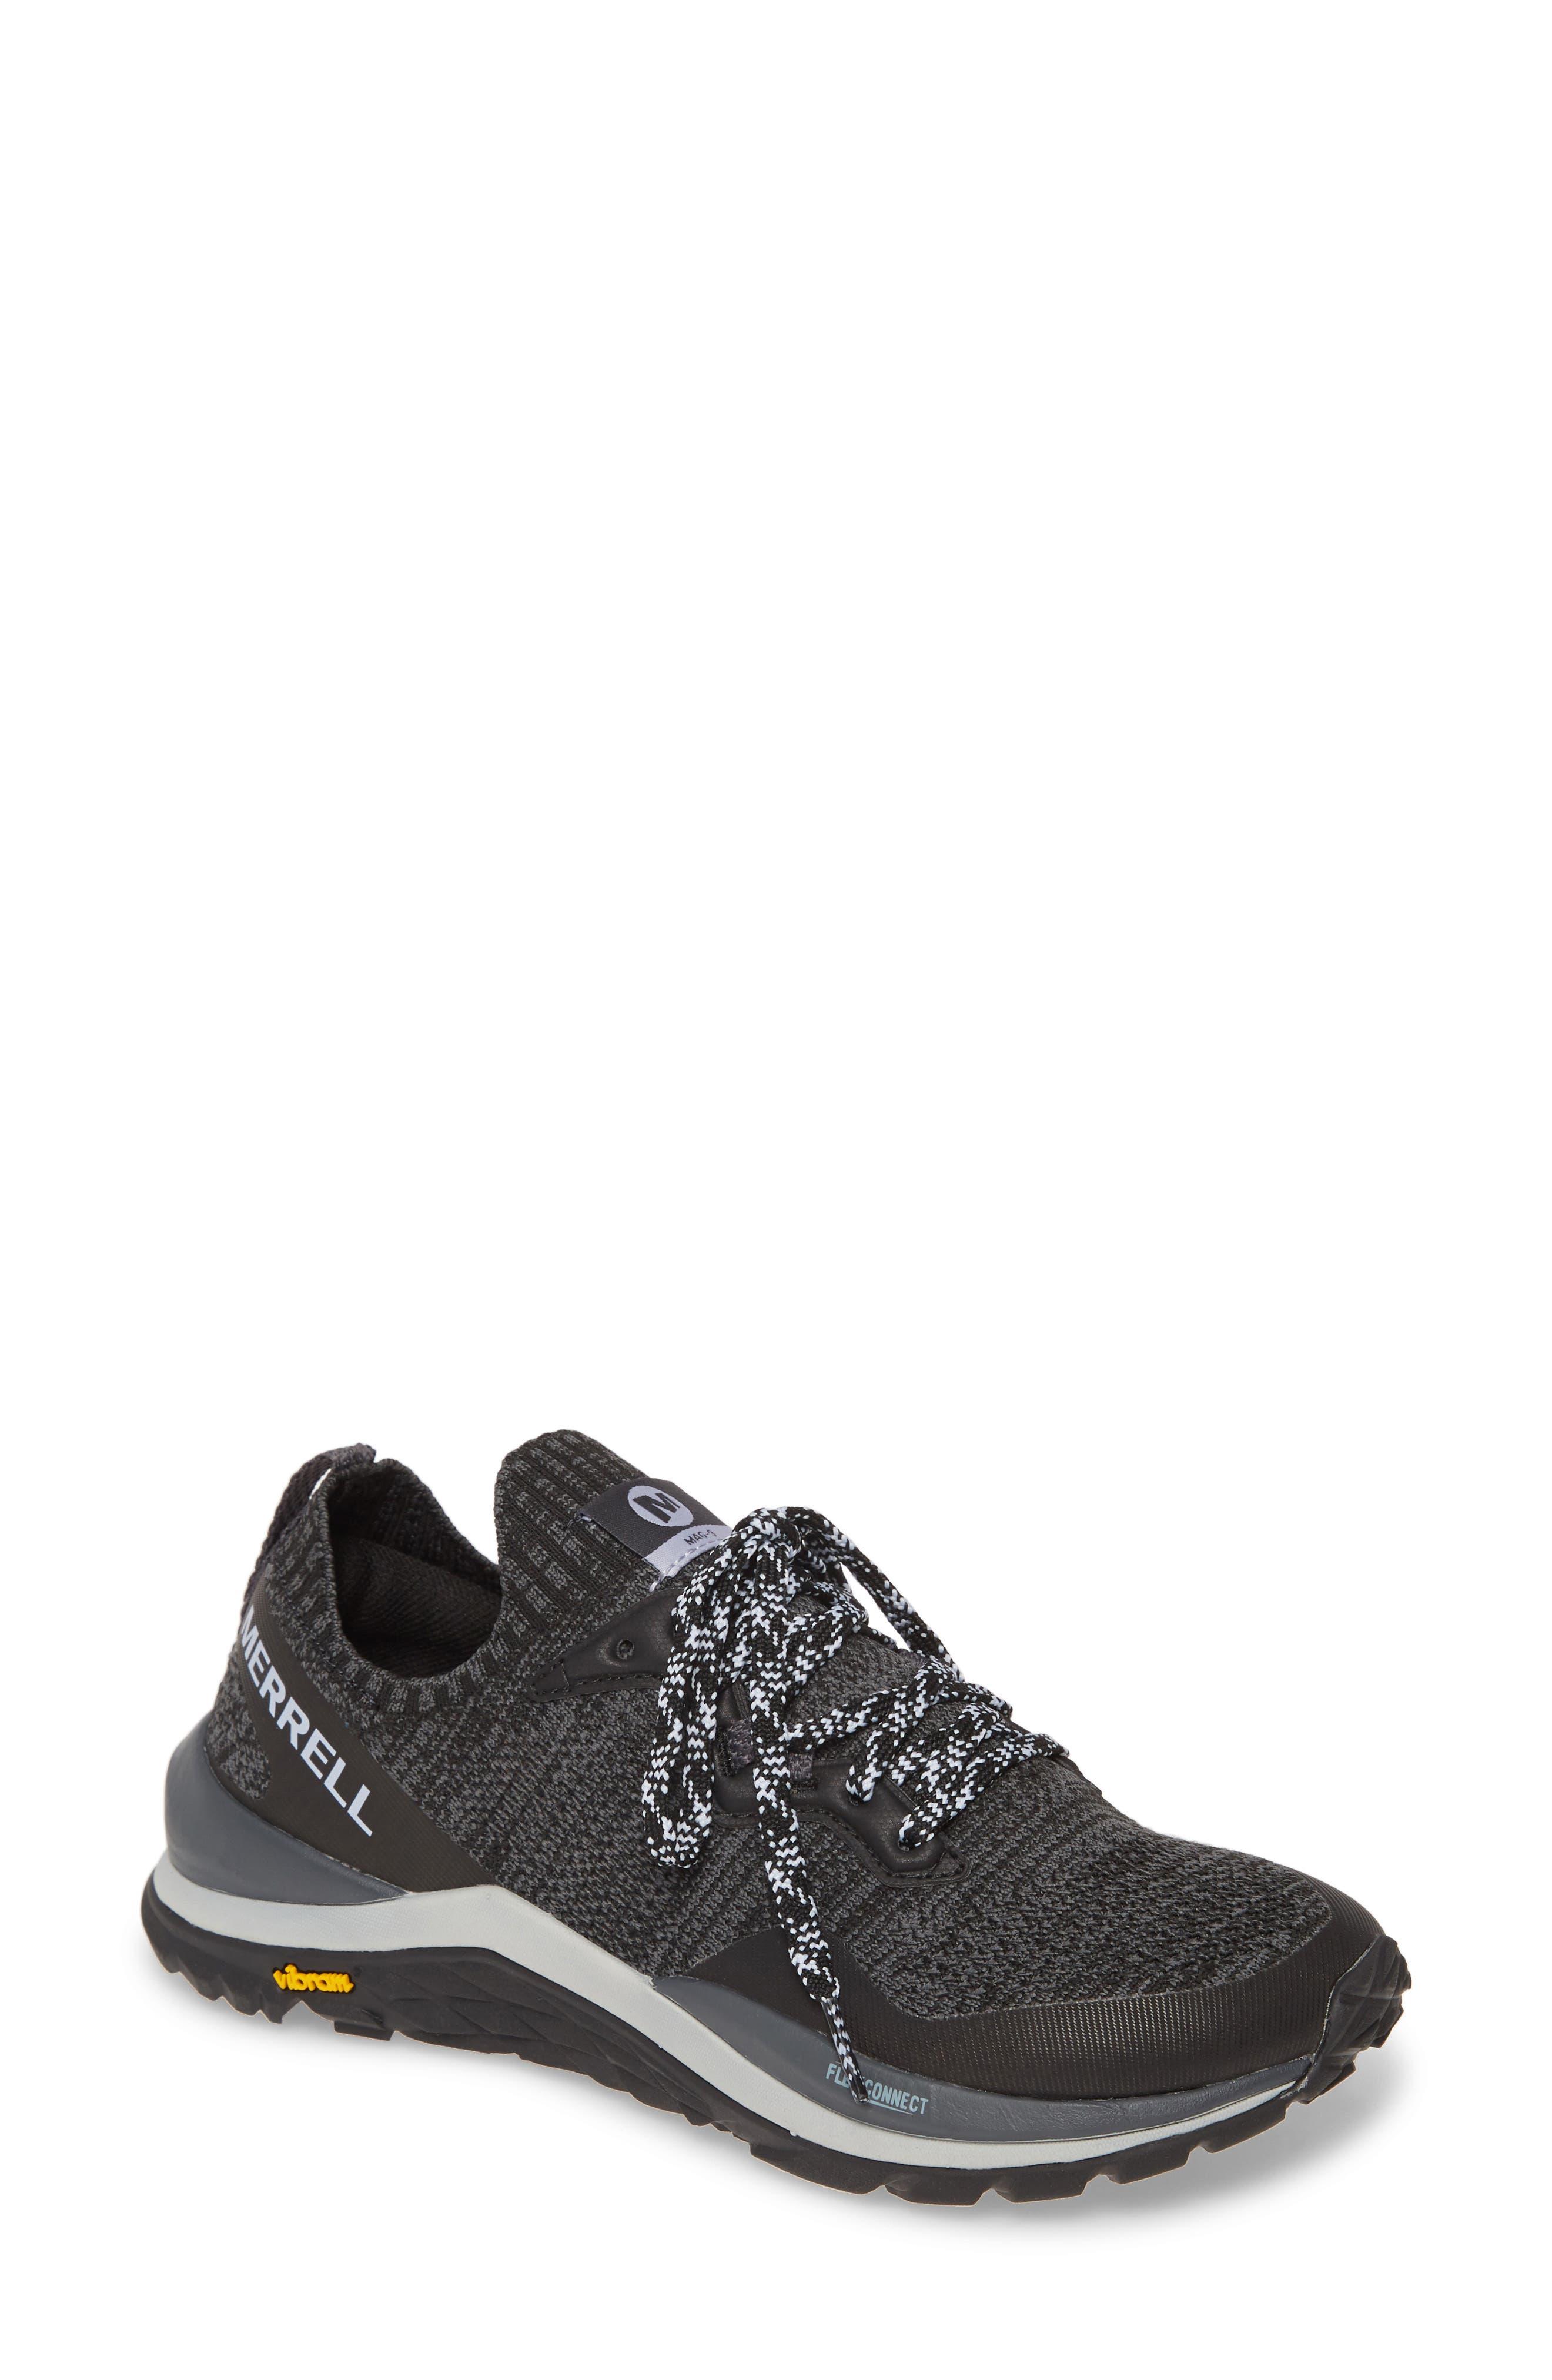 Mag-9 Training Shoe